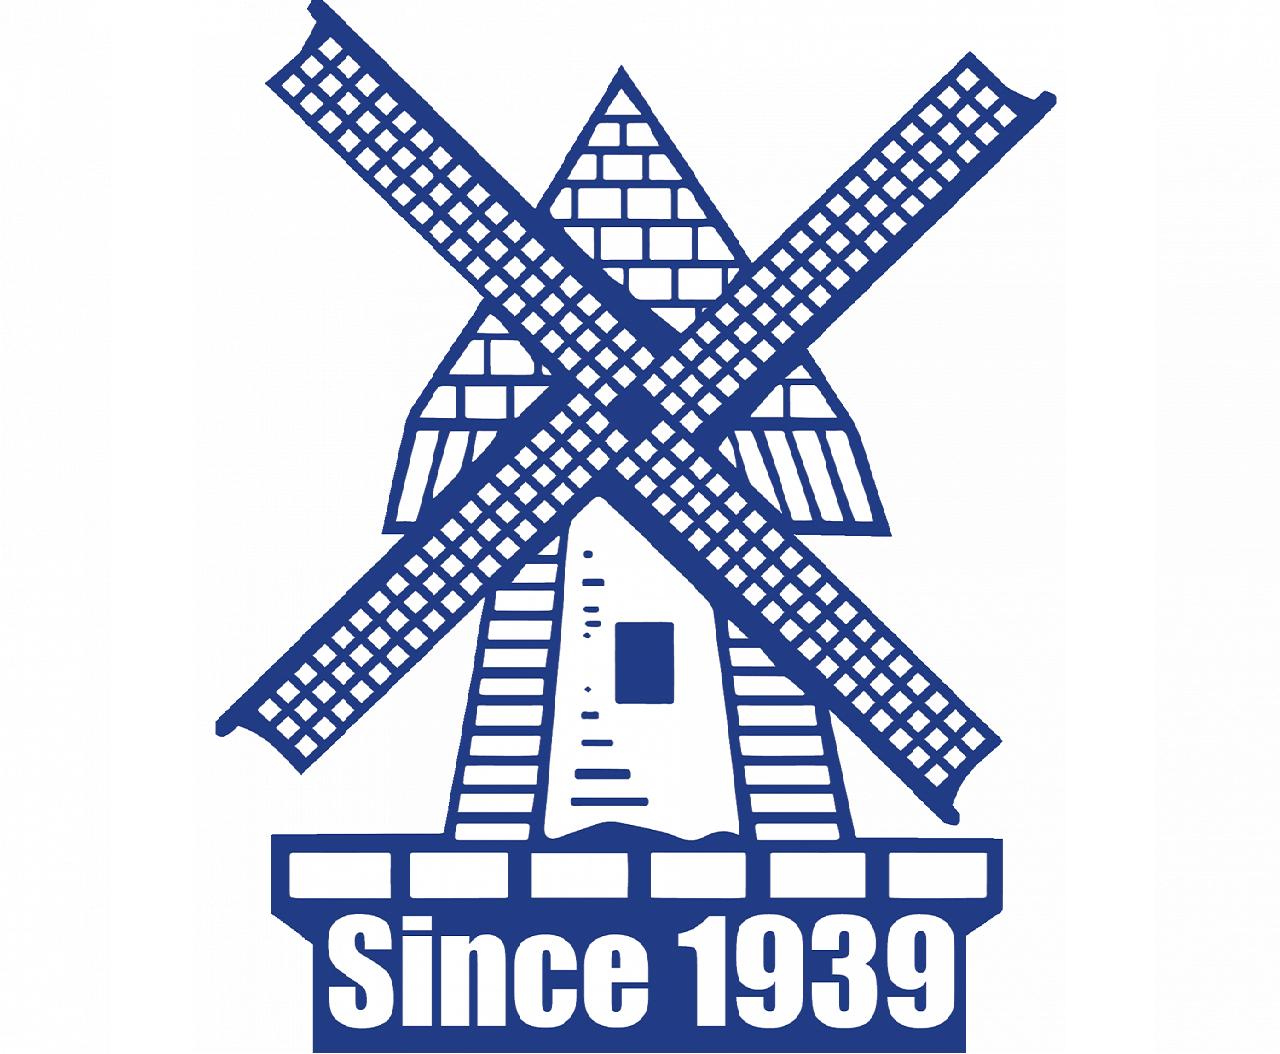 n14 celect cummins n14 celect price 6500 00 [ 1280 x 956 Pixel ]